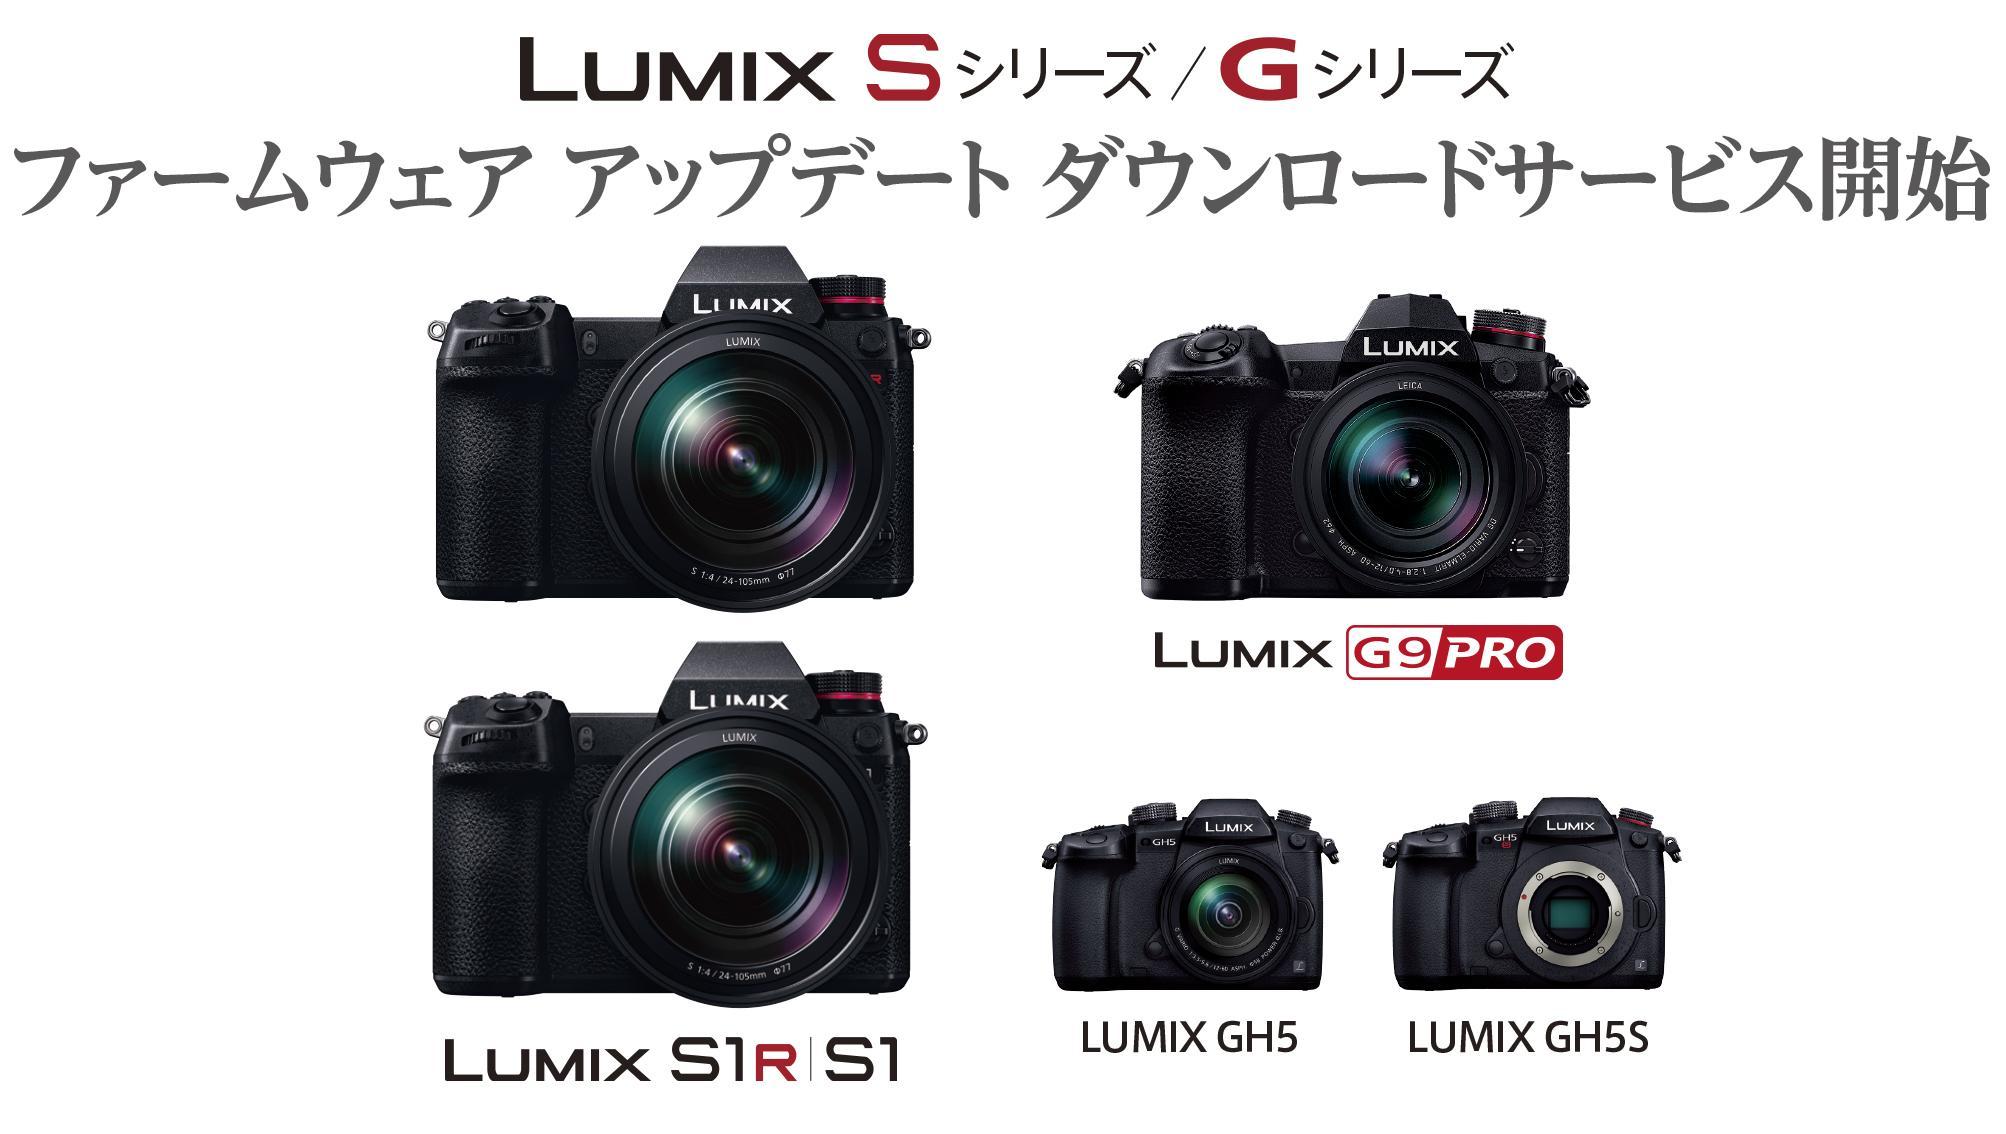 LUMIX Sシリーズ/Gシリーズ ファームウェア アップデート ダウンロードサービス開始